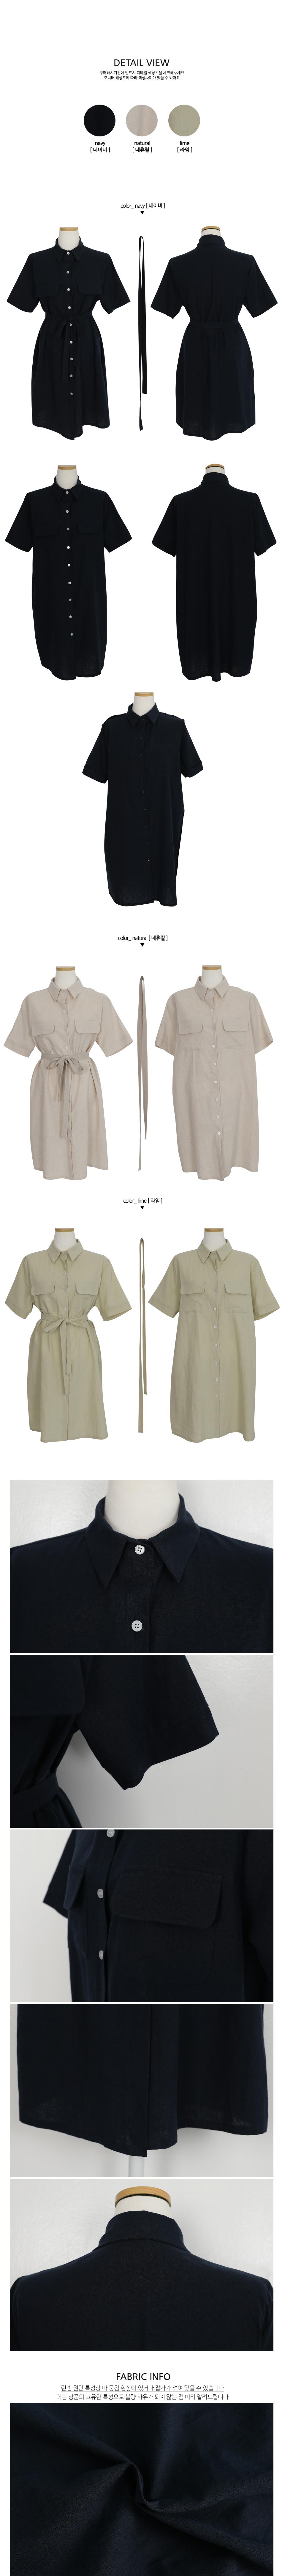 Prue linen pocket dress